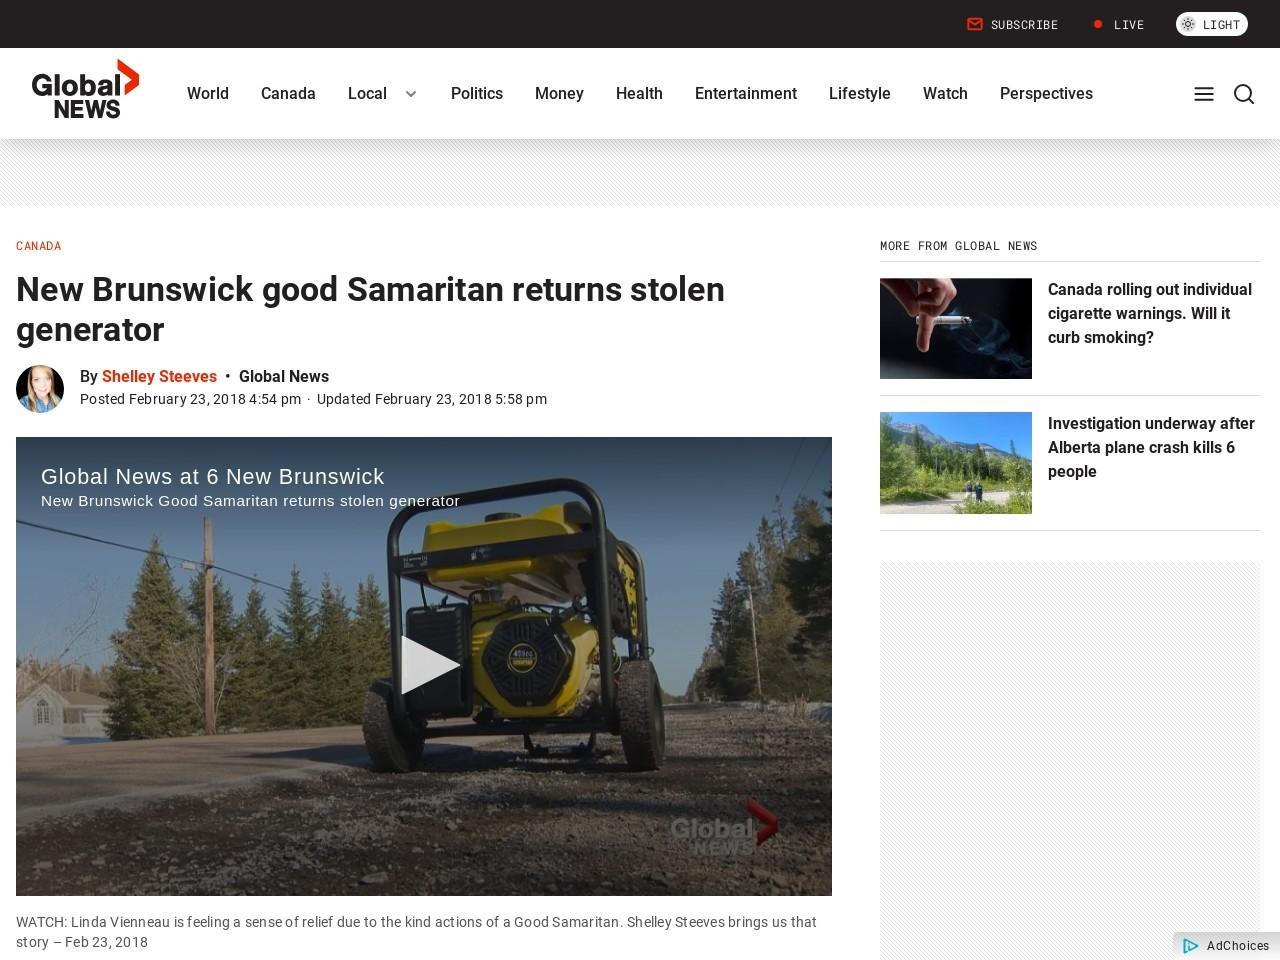 New Brunswick good Samaritan returns stolen generator